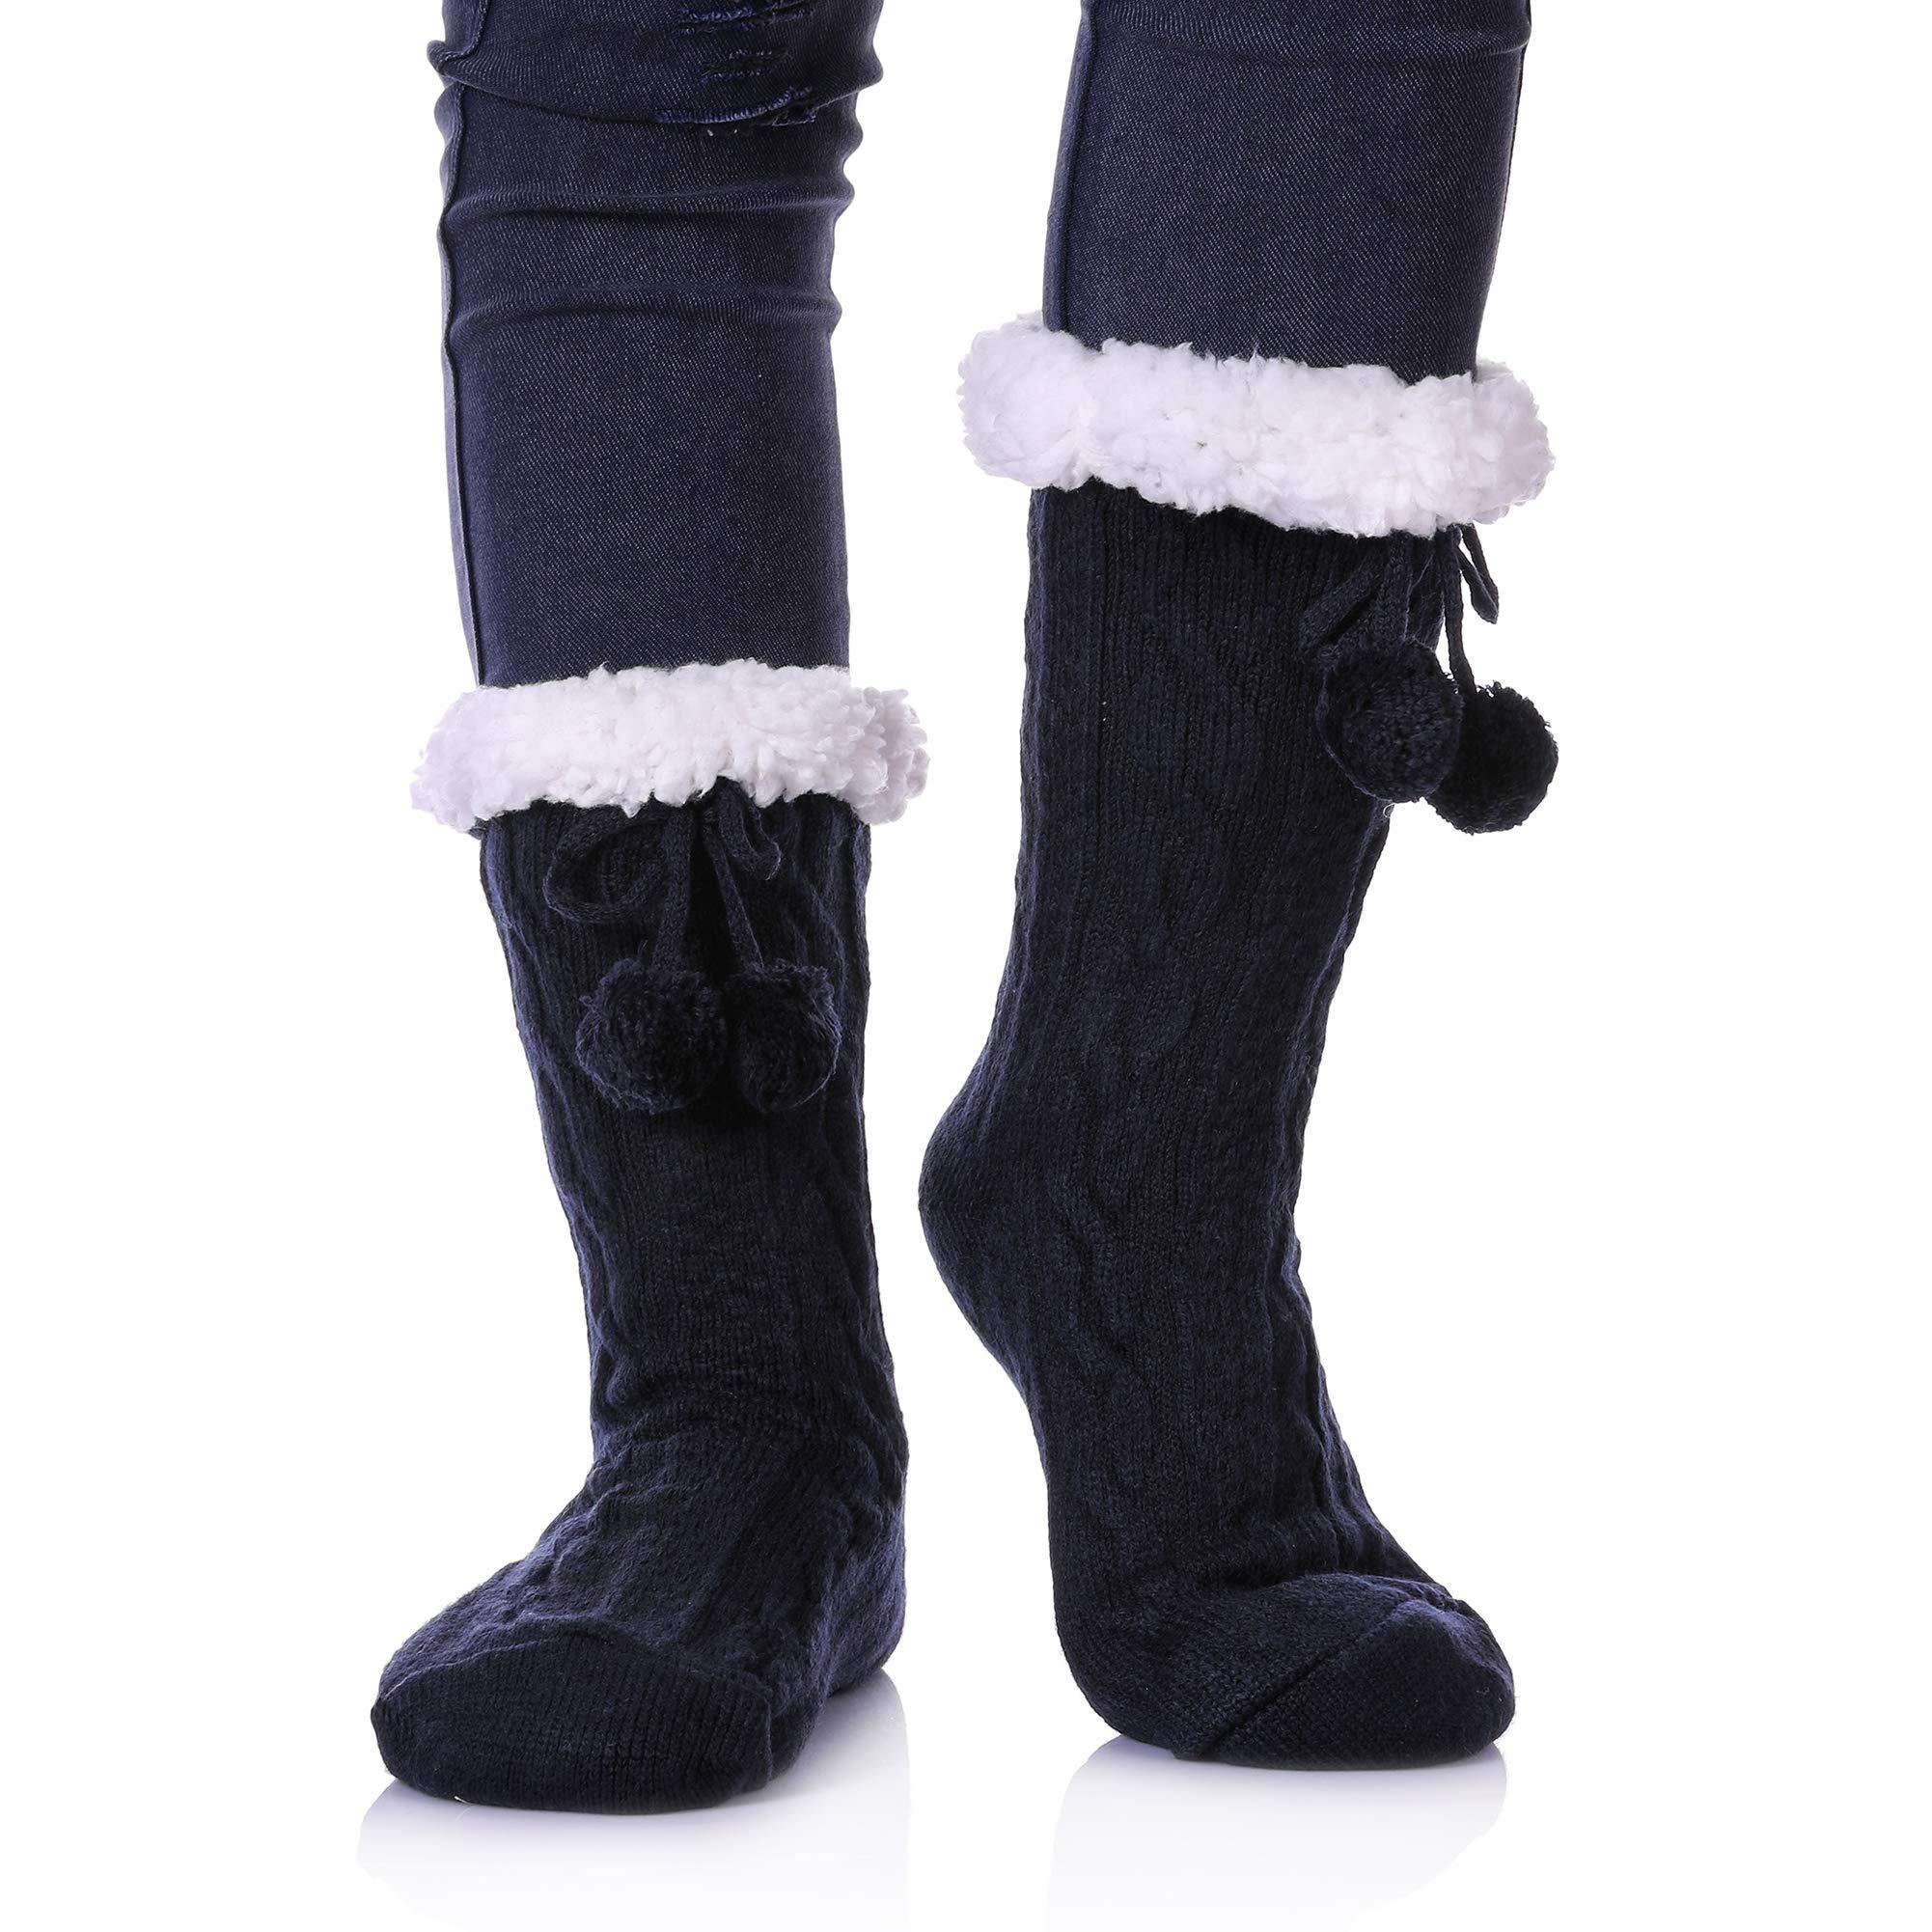 MUMUWU Mens PU Leather Business Oxfords Faux Crocodile Skin Texture Slip-on Loafers Fashion Slipper